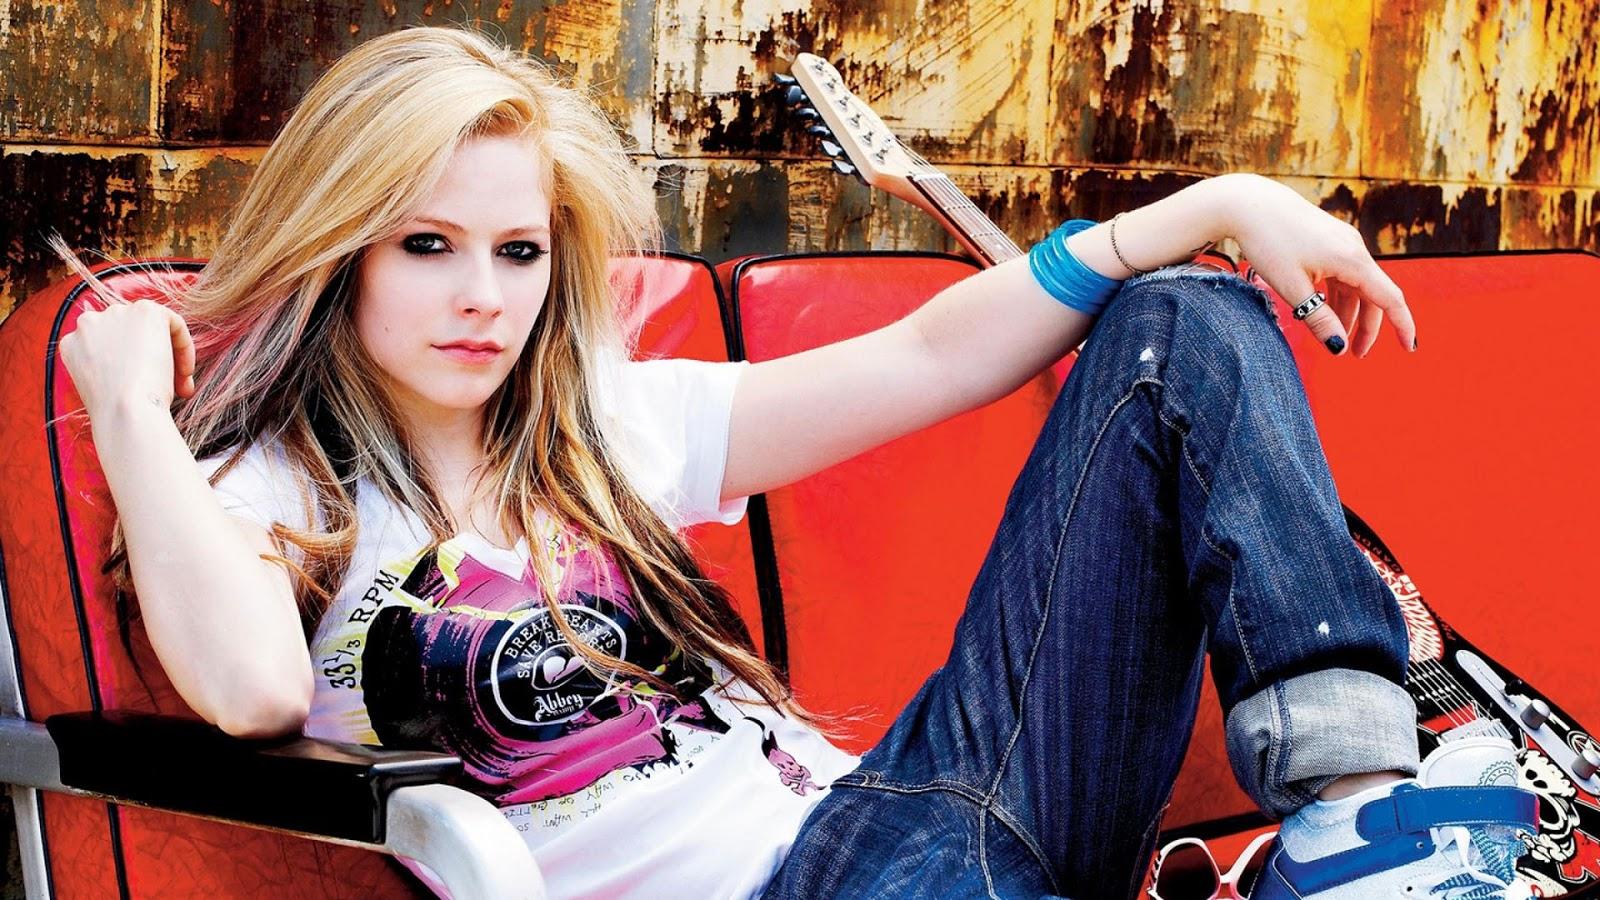 http://2.bp.blogspot.com/-pMKCbY0IJUI/UWVHR_IdPlI/AAAAAAAAJ5A/gdFCWaiRilQ/s1600/Avril+Lavigne+Beautiful+hd+Wallpapers+2013_7.jpg